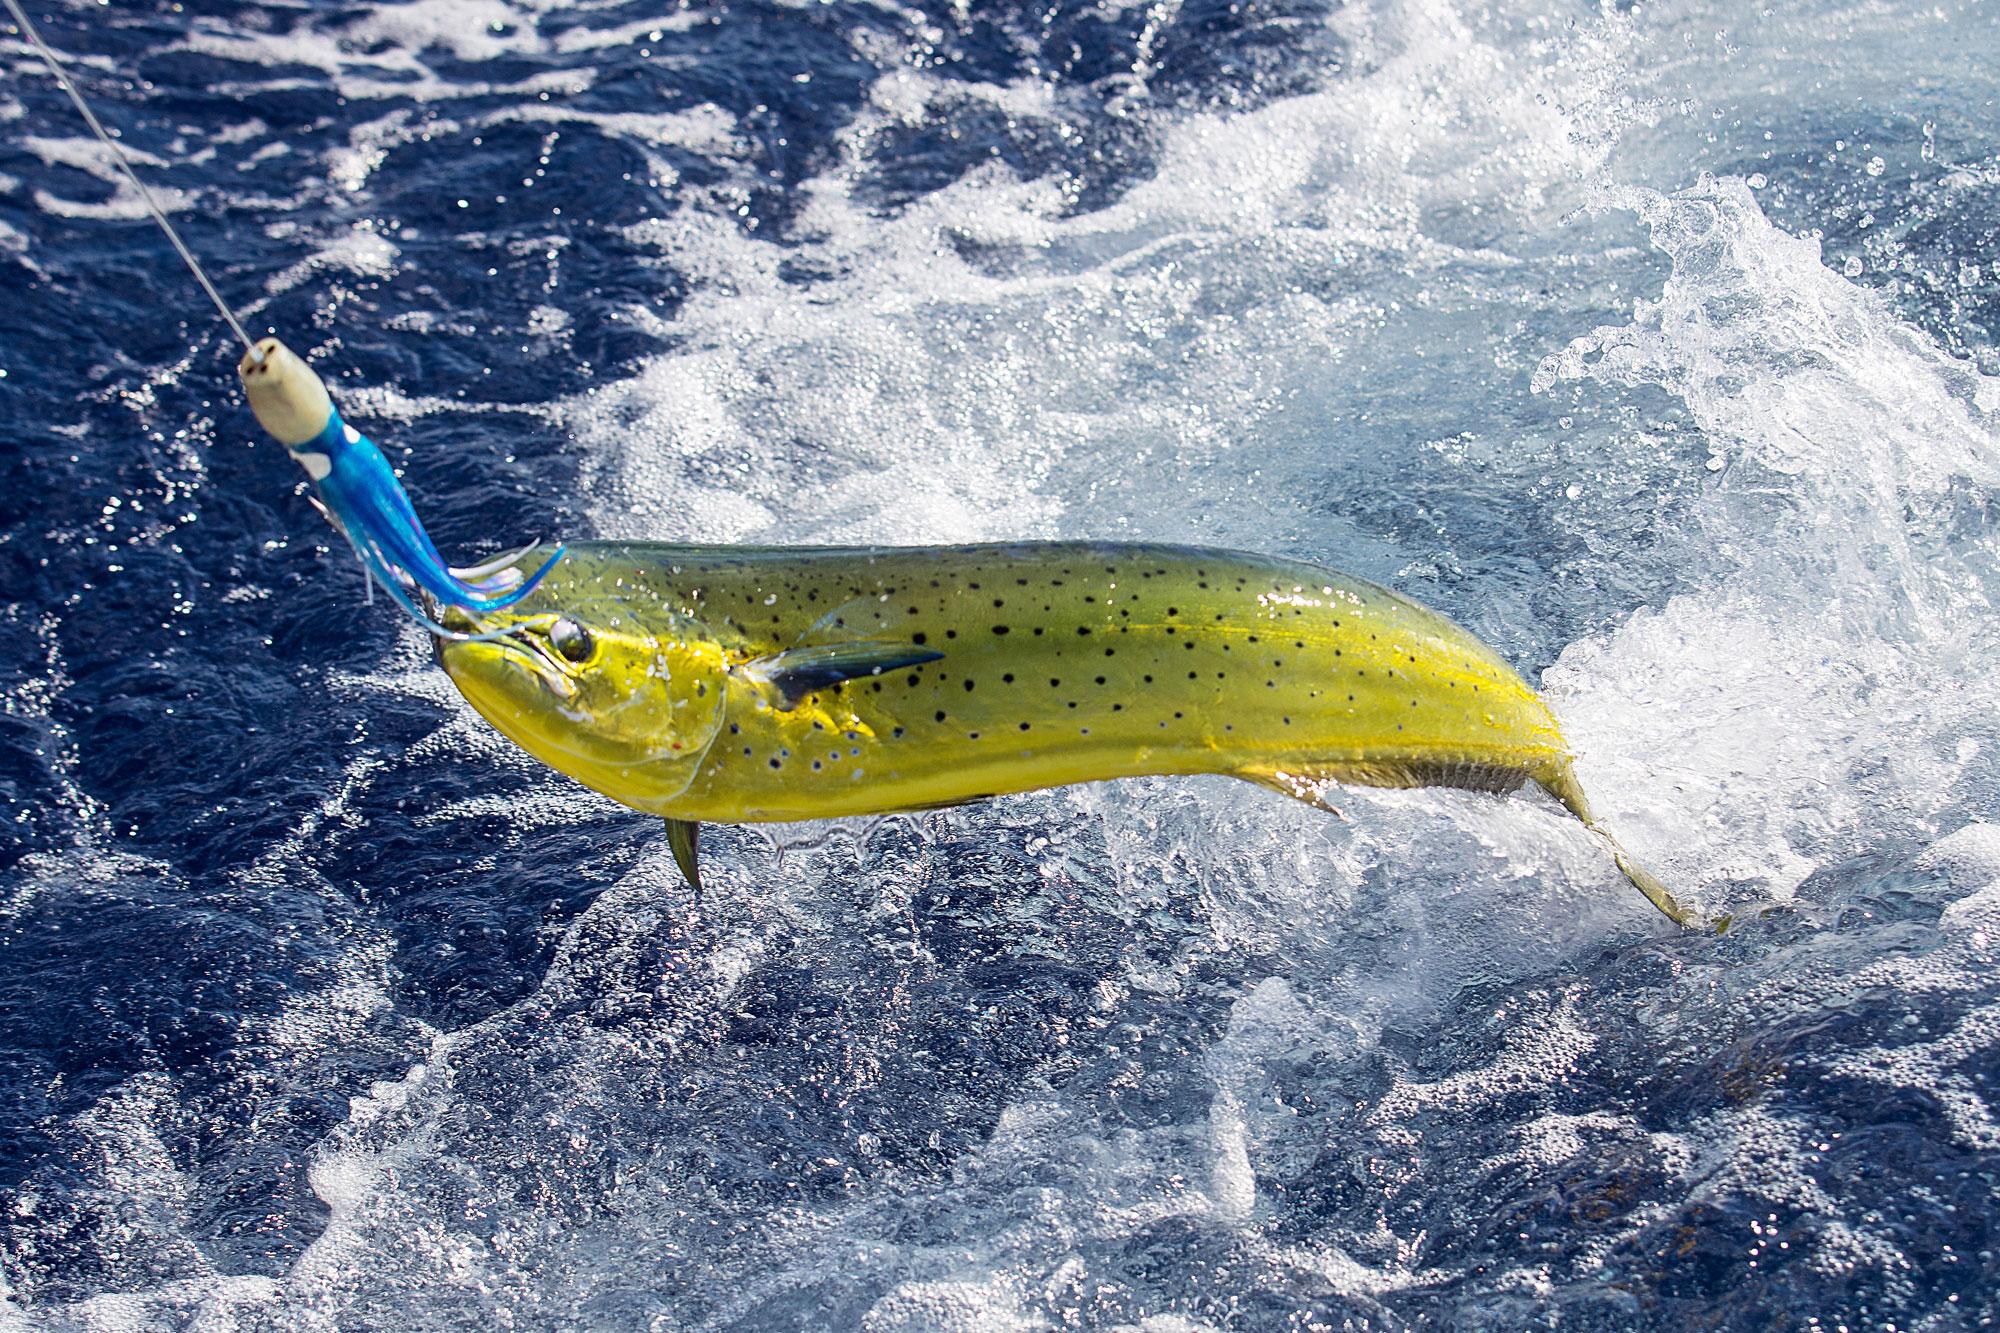 Quit Wishin, Let's Go Fishin!